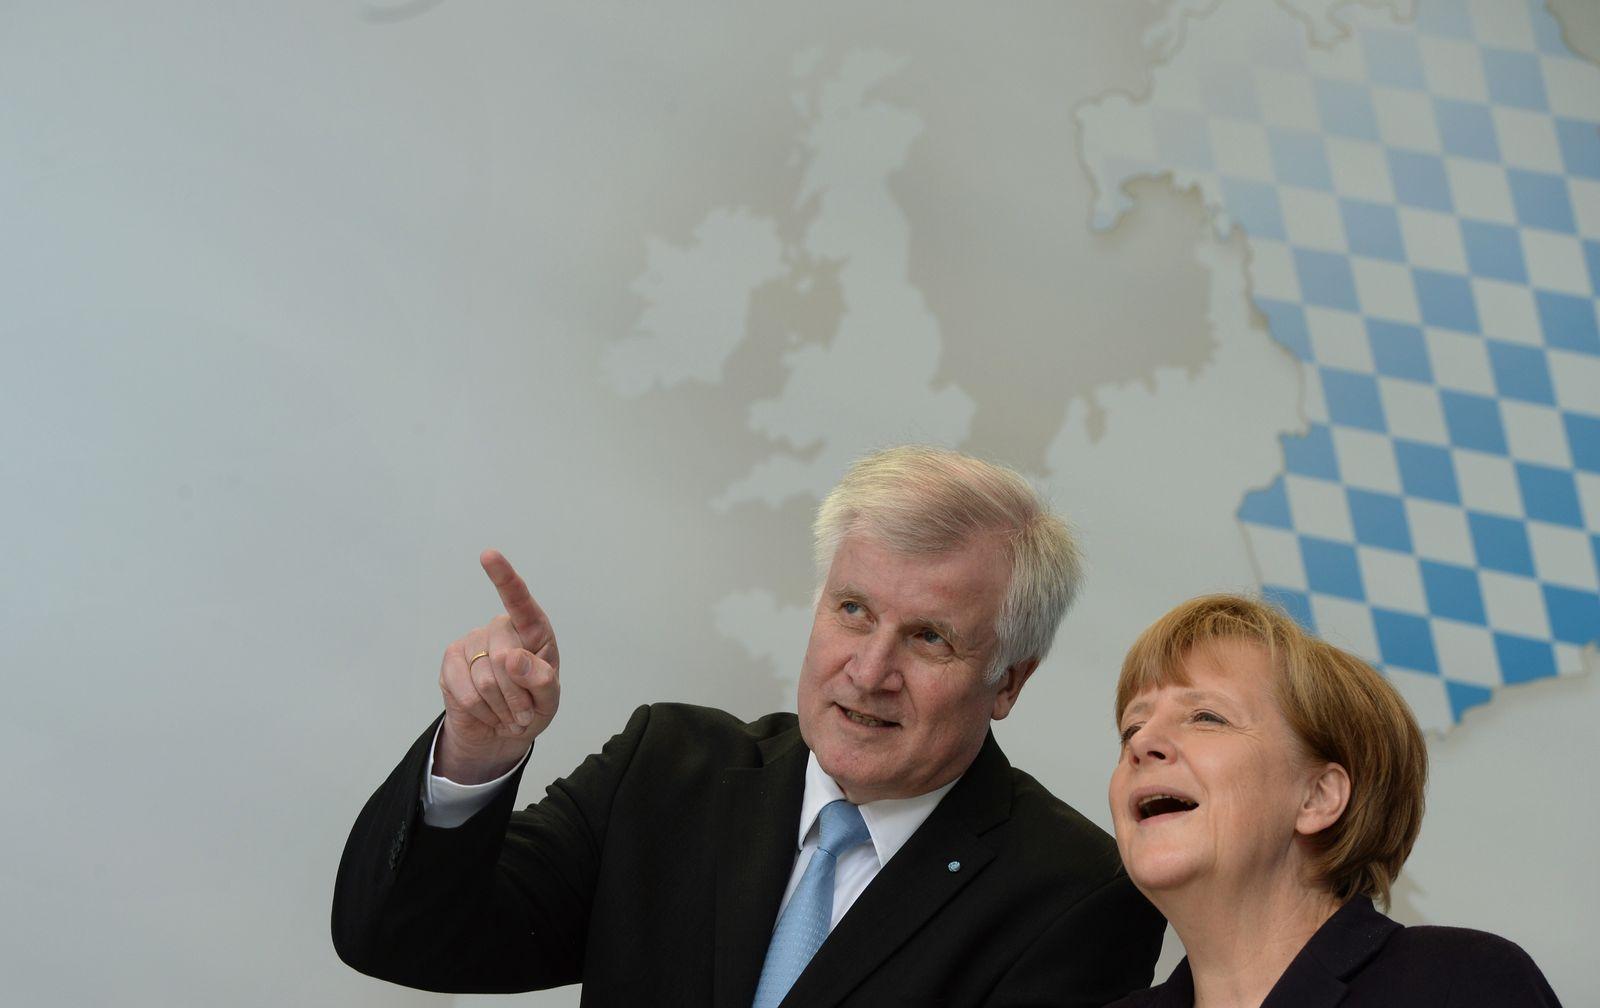 Merkel / Seehofer